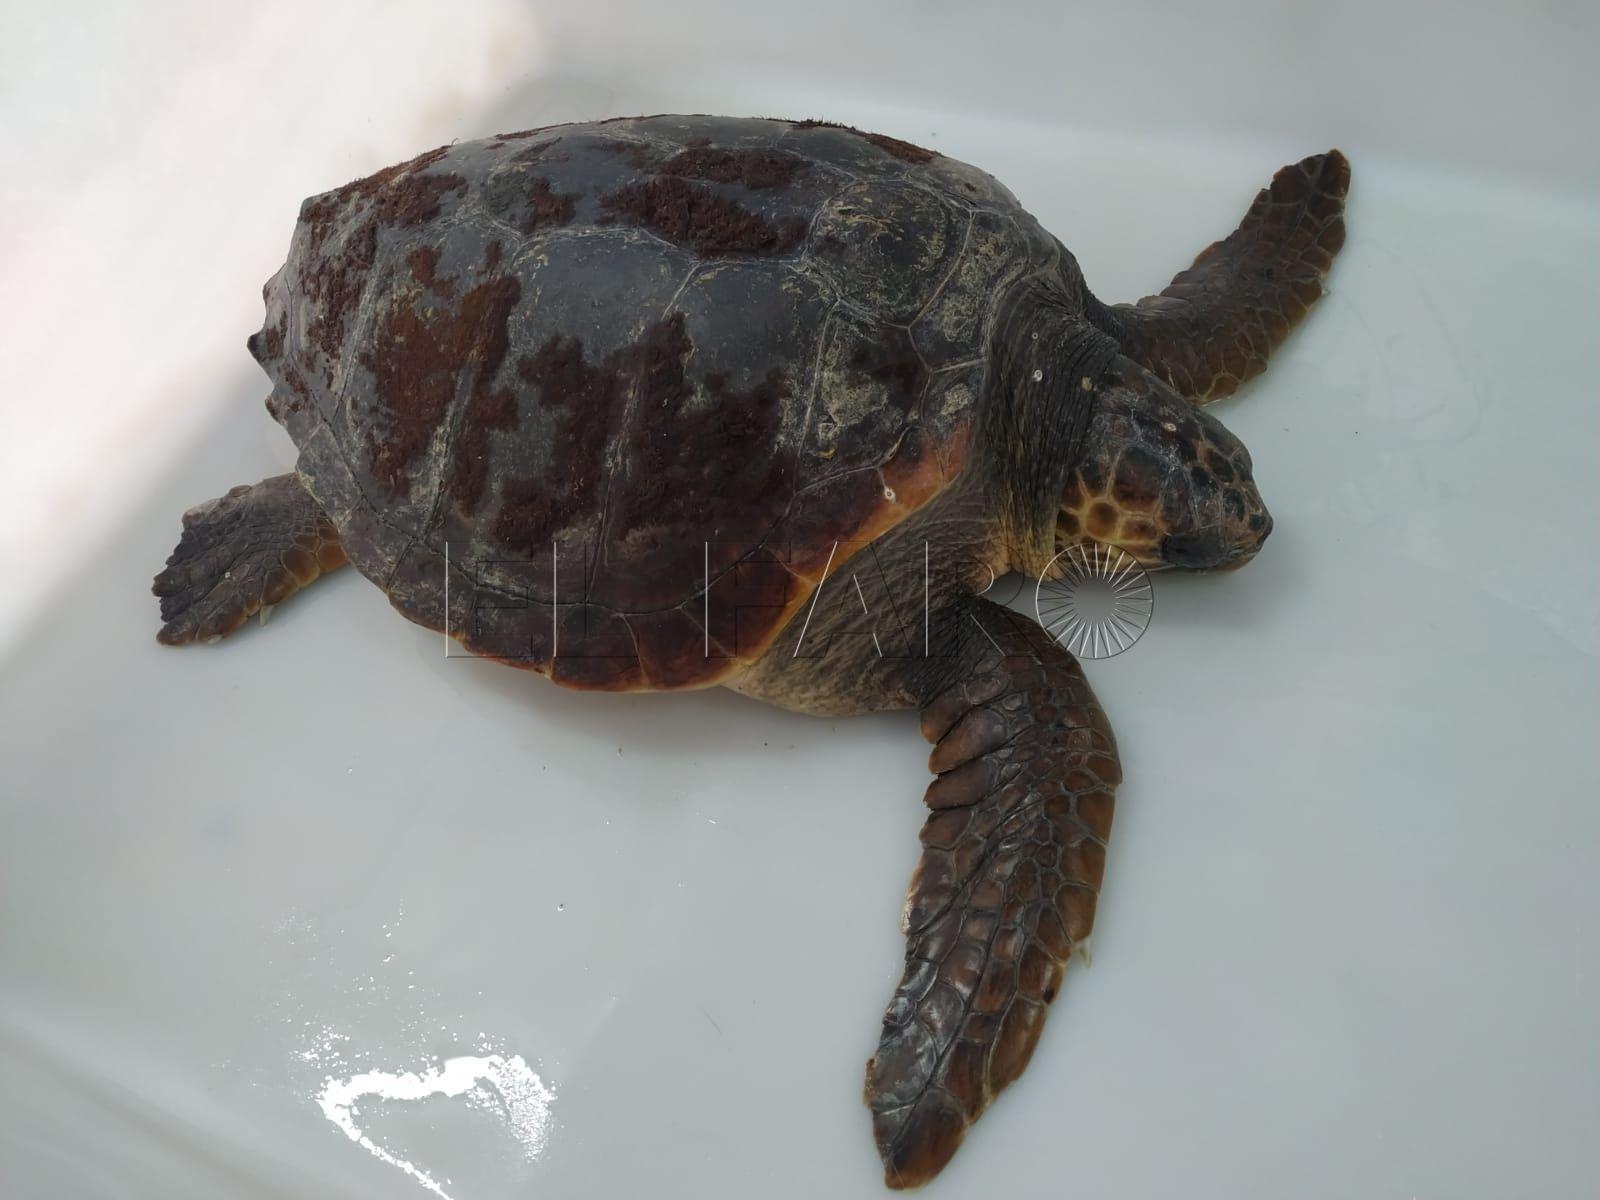 tortuga-almadraba-cecam-agosto-12-2